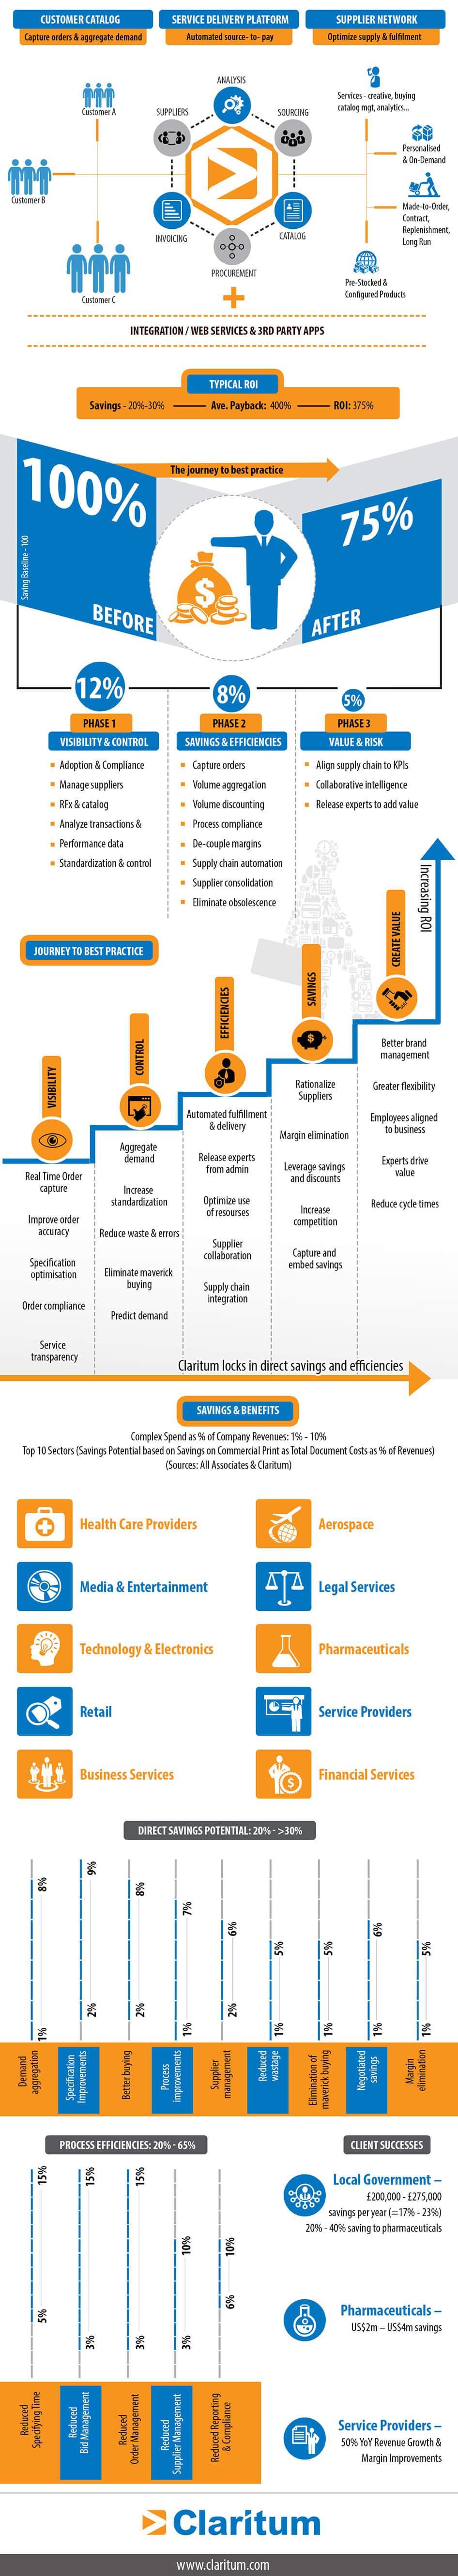 Complex Spend Eprocurement infographic